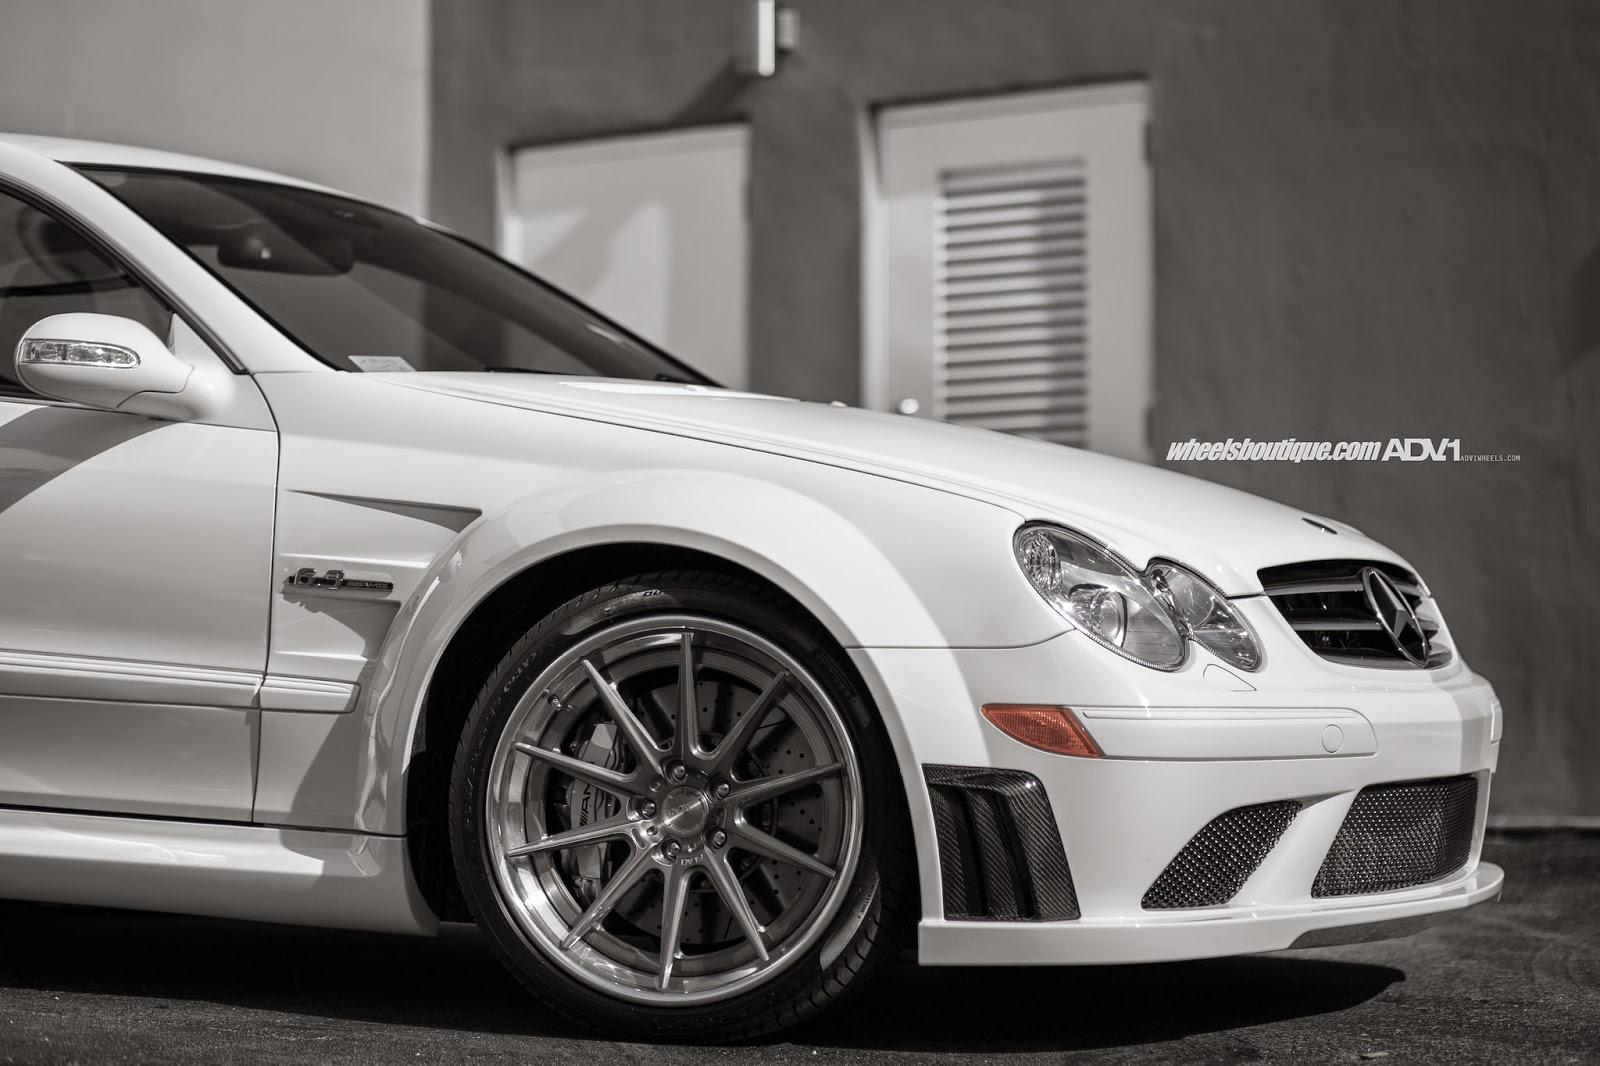 Mercedes Benz Clk63 Amg Black Series On Adv 1 Wheels